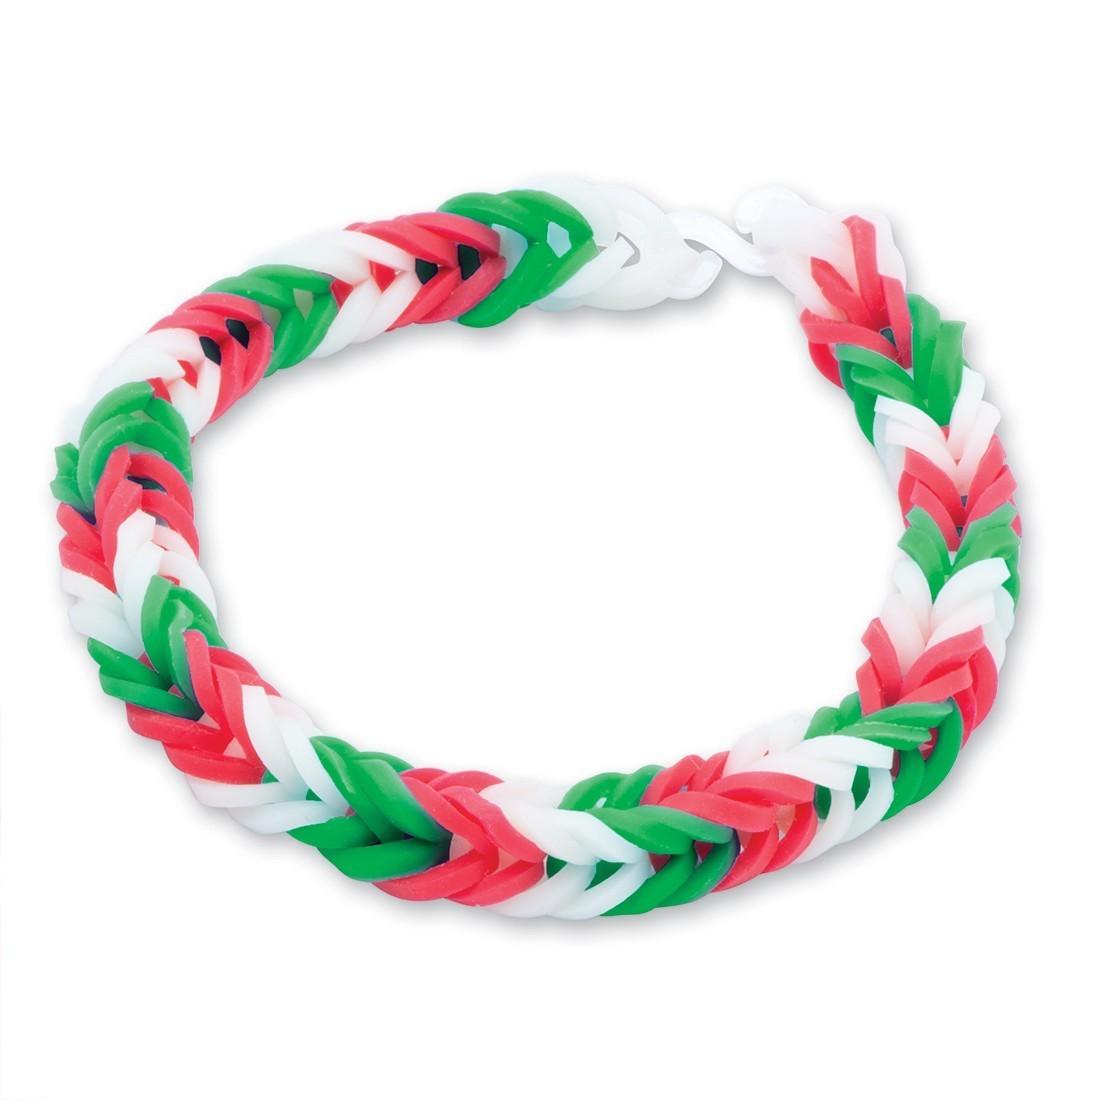 Christmas Stretchy Band Bracelets [image]